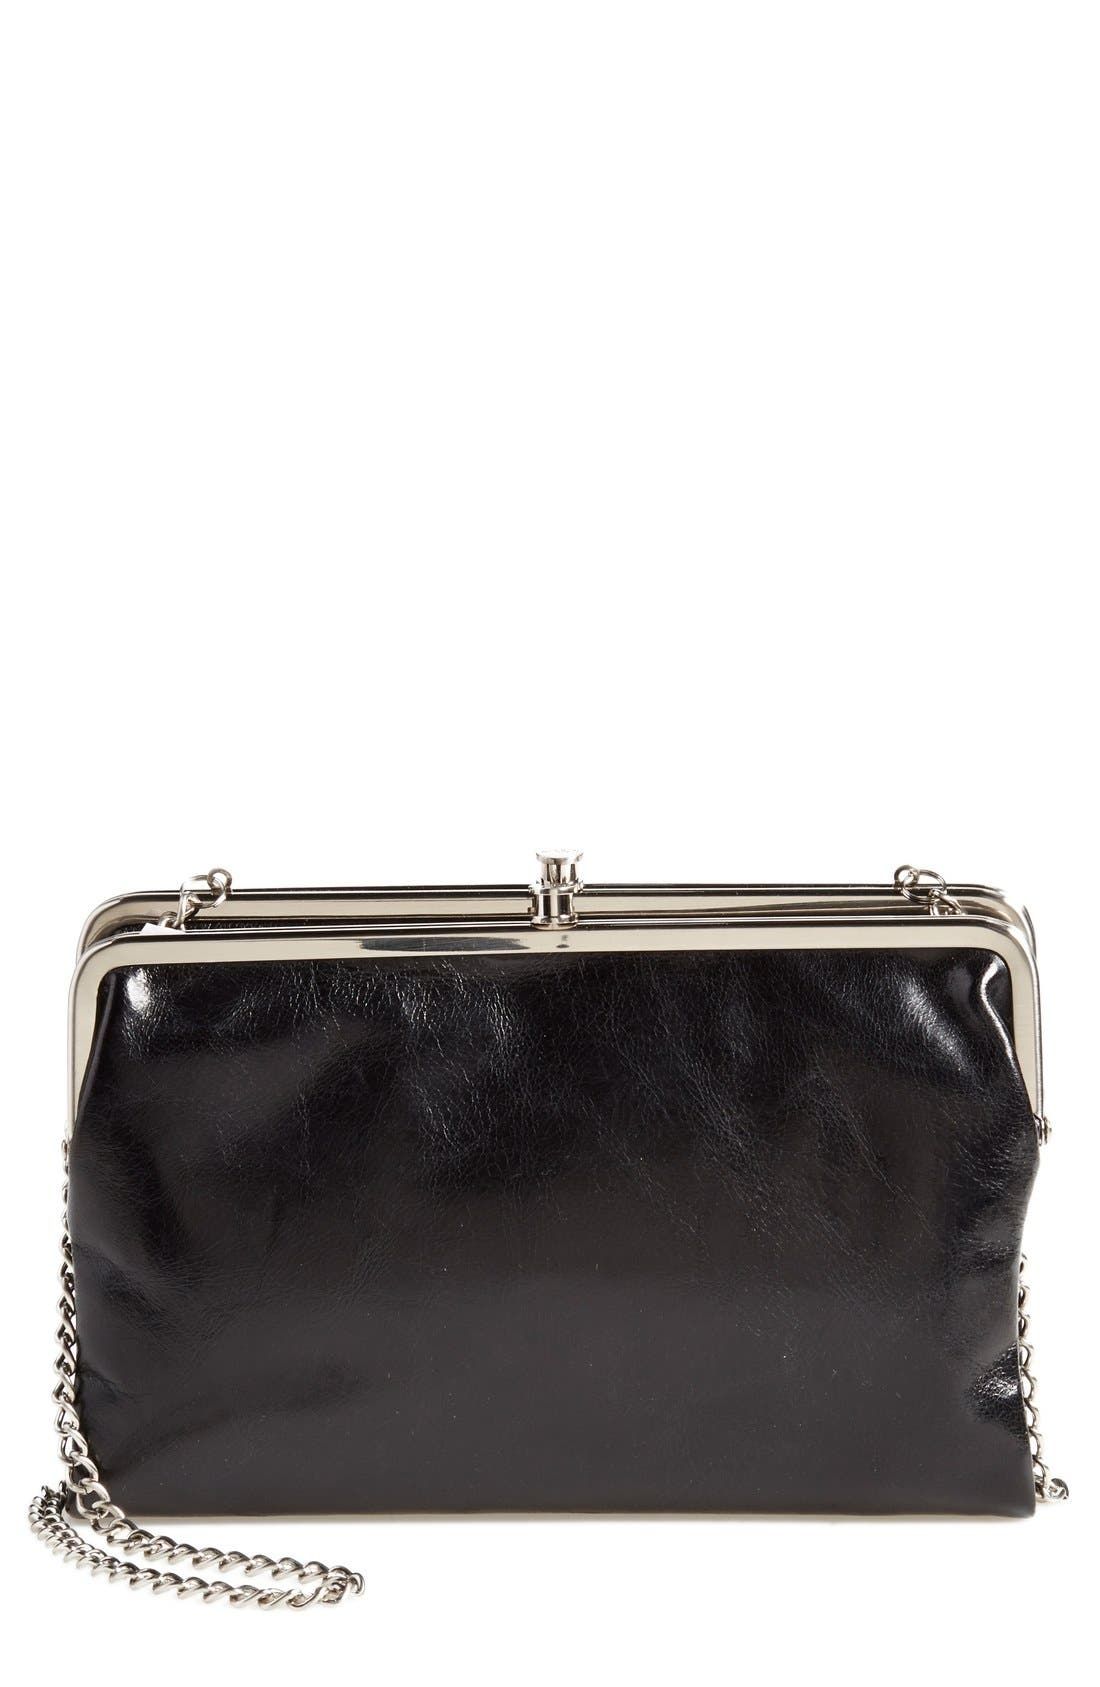 'Vintage Leanne' Leather Crossbody Bag, Main, color, 001